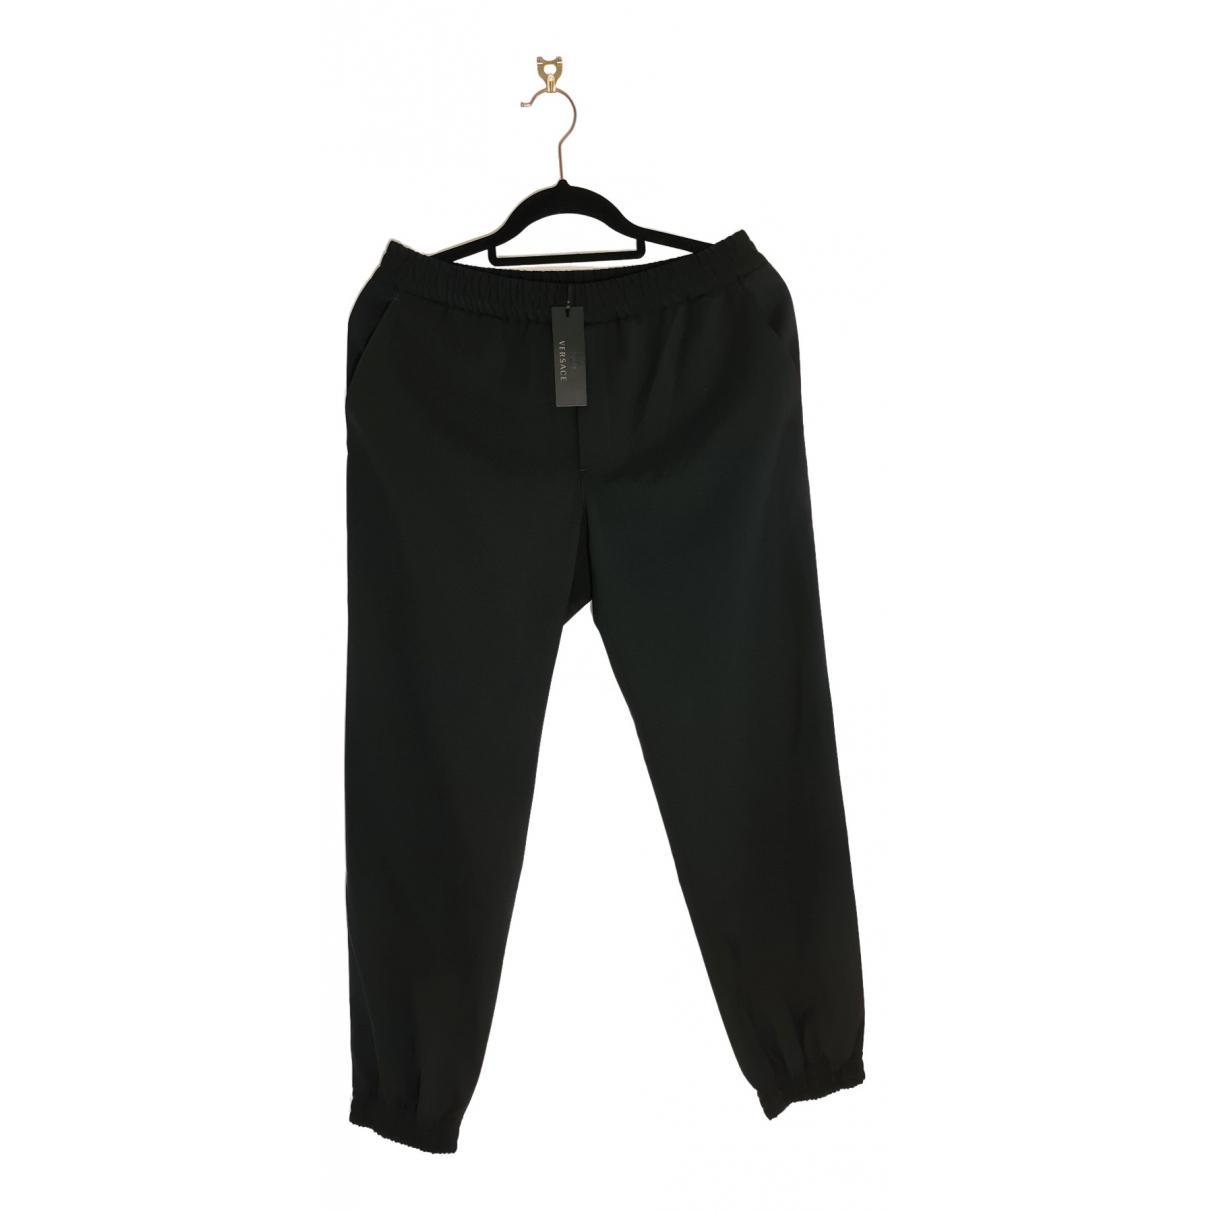 Versace \N Black Cotton Trousers for Men 30 UK - US